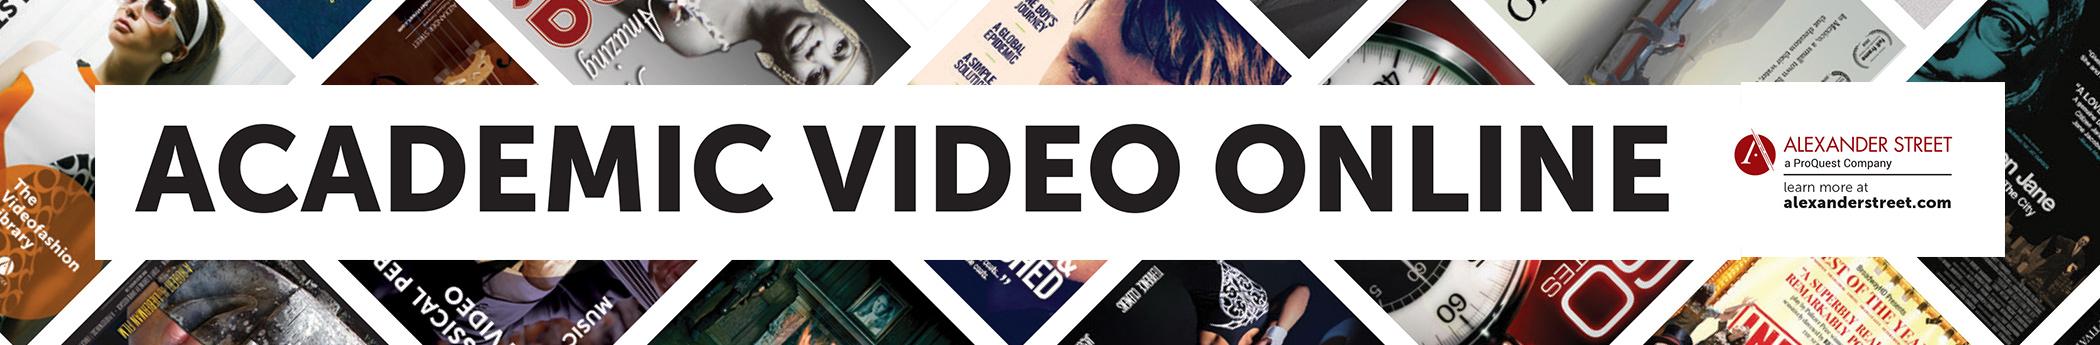 Academic Video Online: Alexander Street, A ProQuest Company